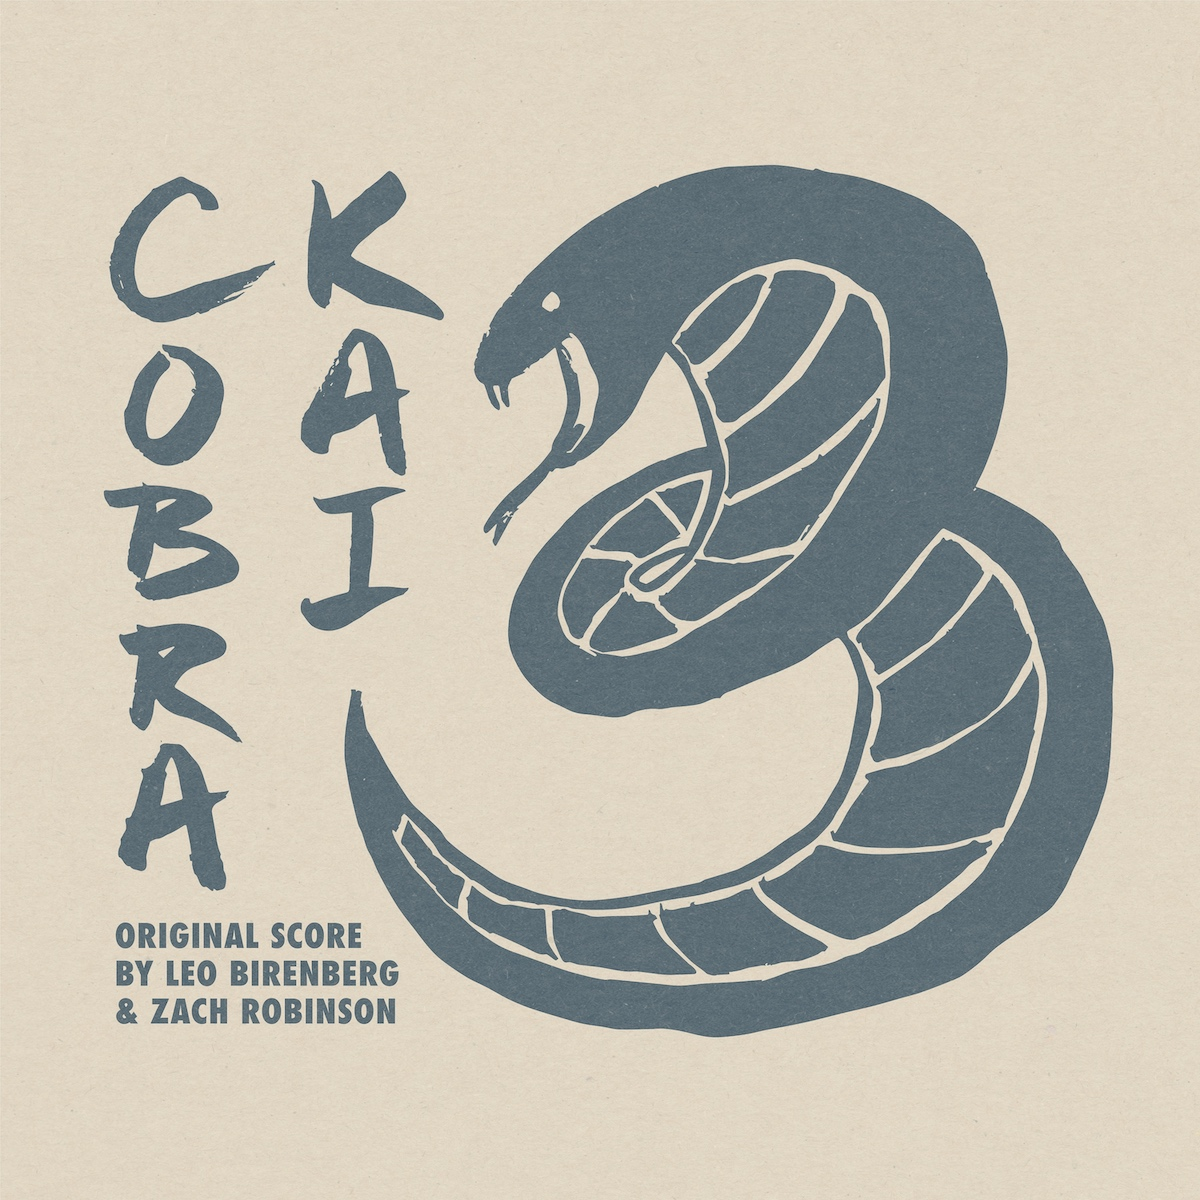 cobra kai season 3 netflix soundtrack cover art